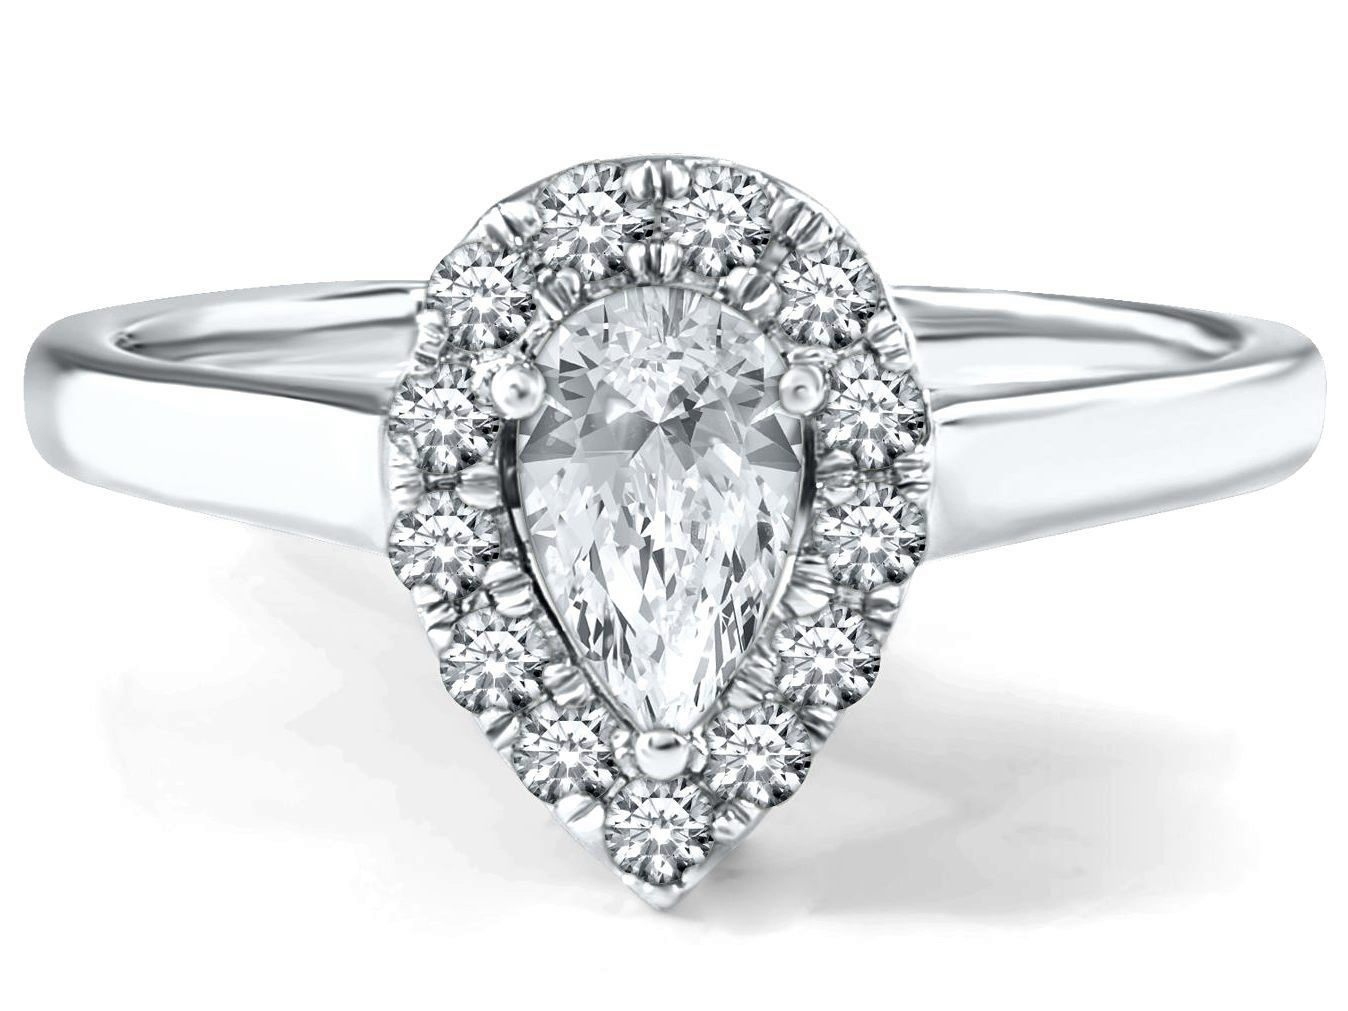 engagement ring pear shape diamond petite halo engagement